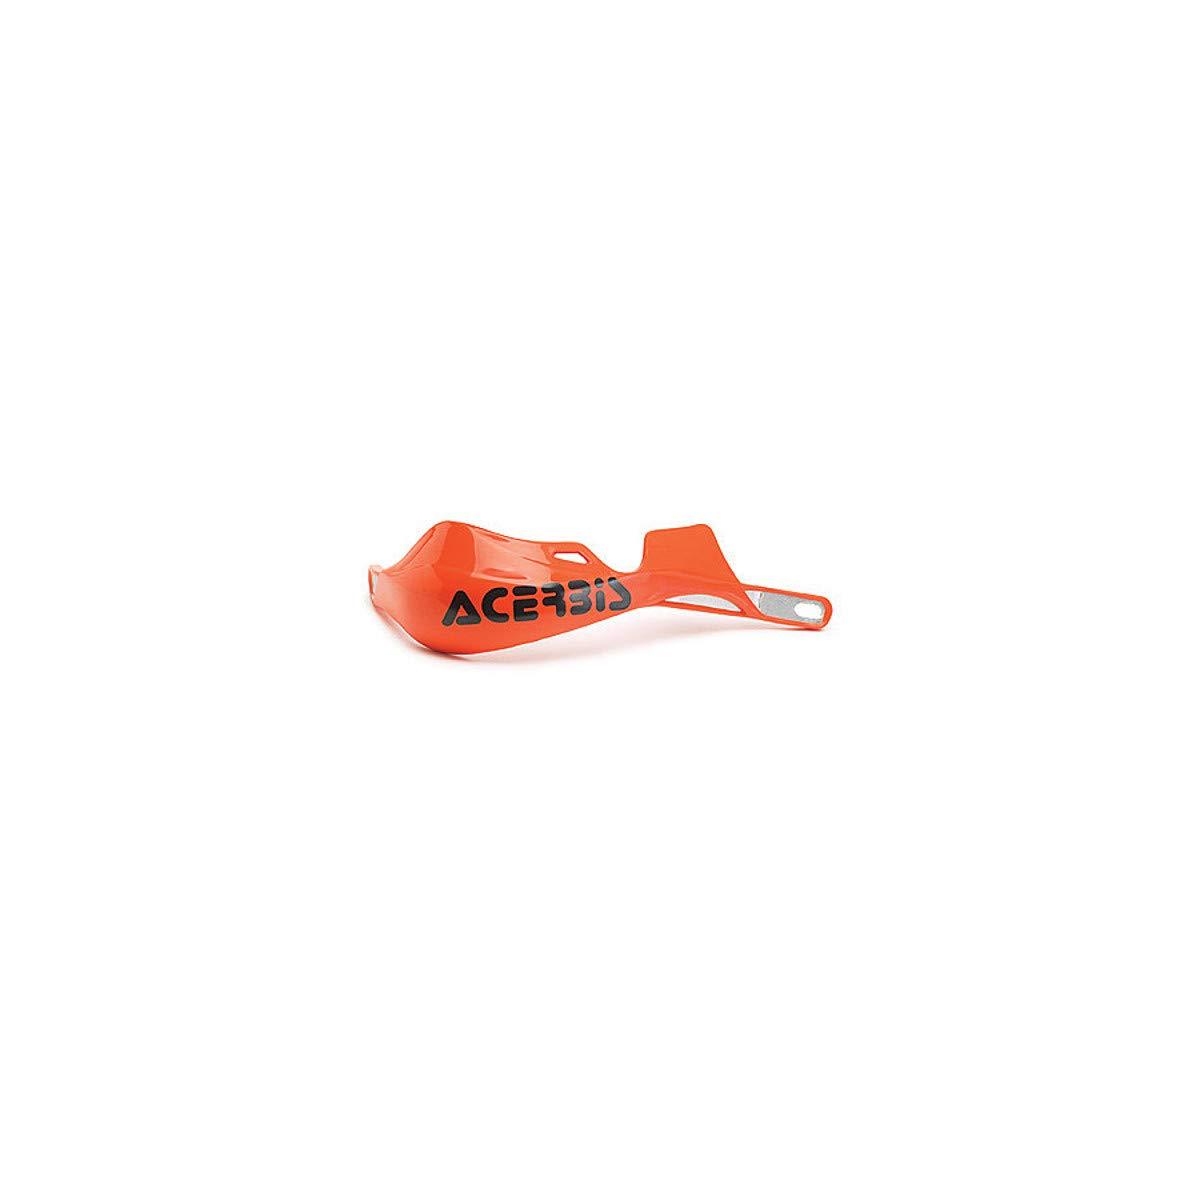 Acerbis 2142000237 Rally Pro X-Strong Orange Handguard, One Size